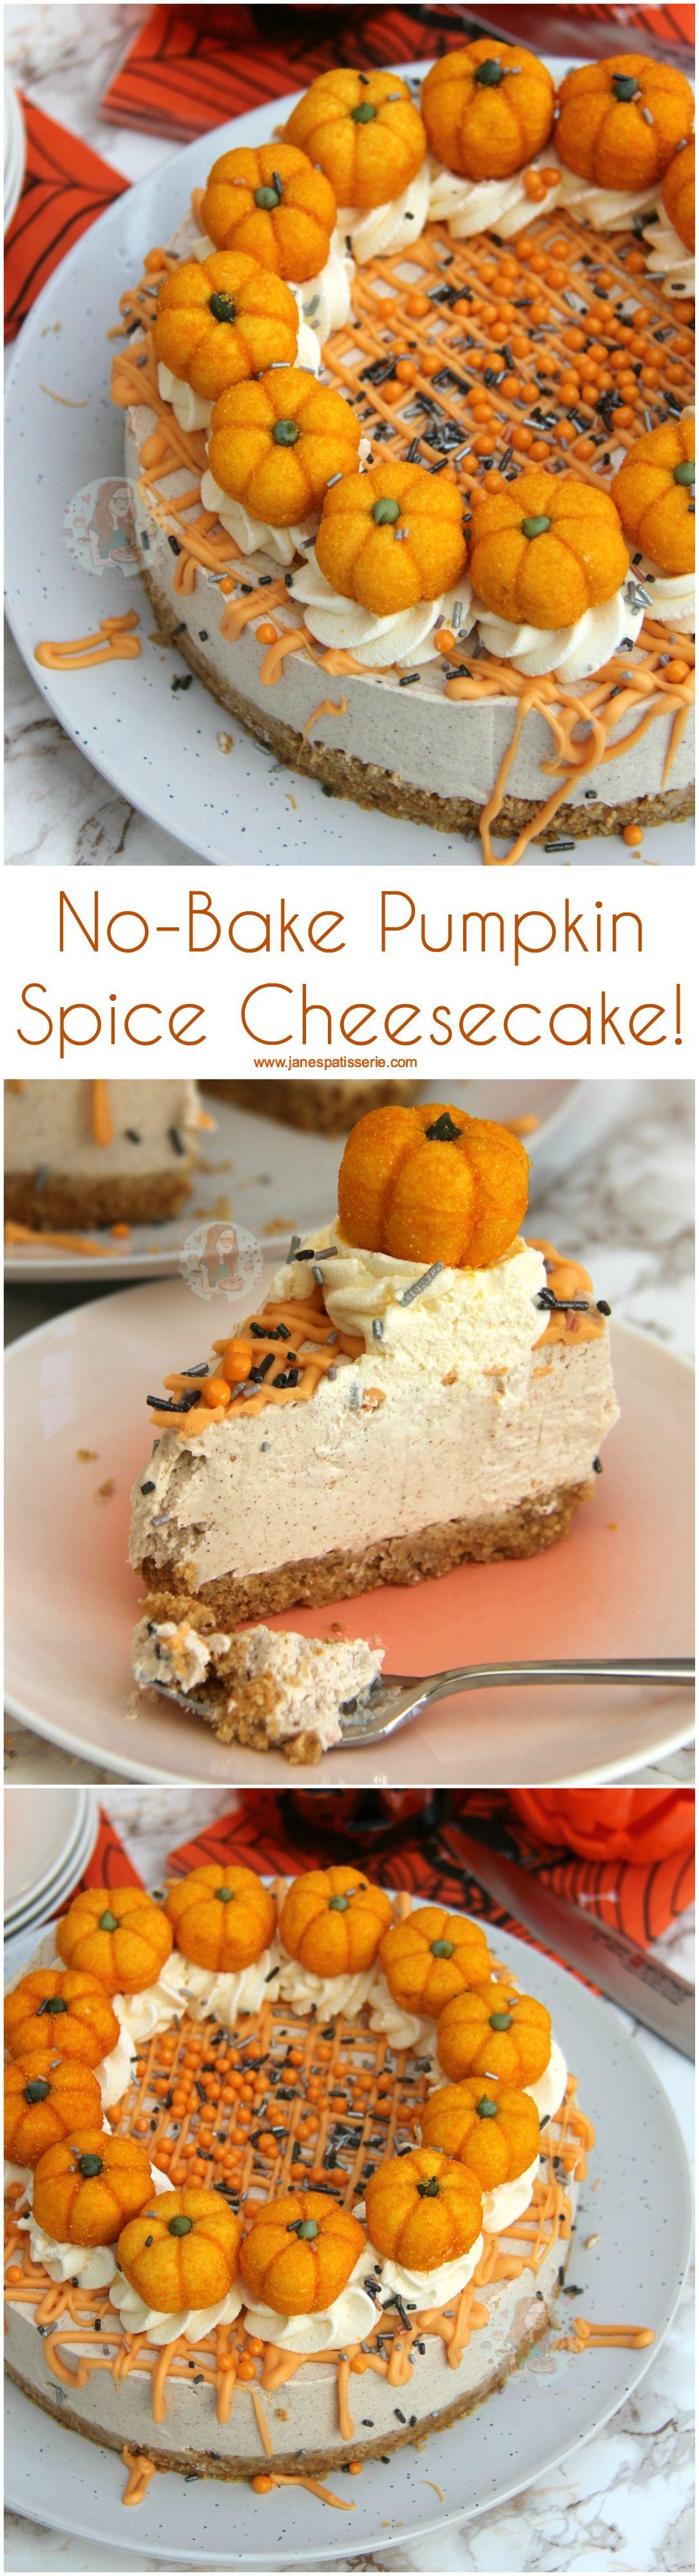 NoBake Pumpkin Spice Cheesecake! ️ Perfect Treat for